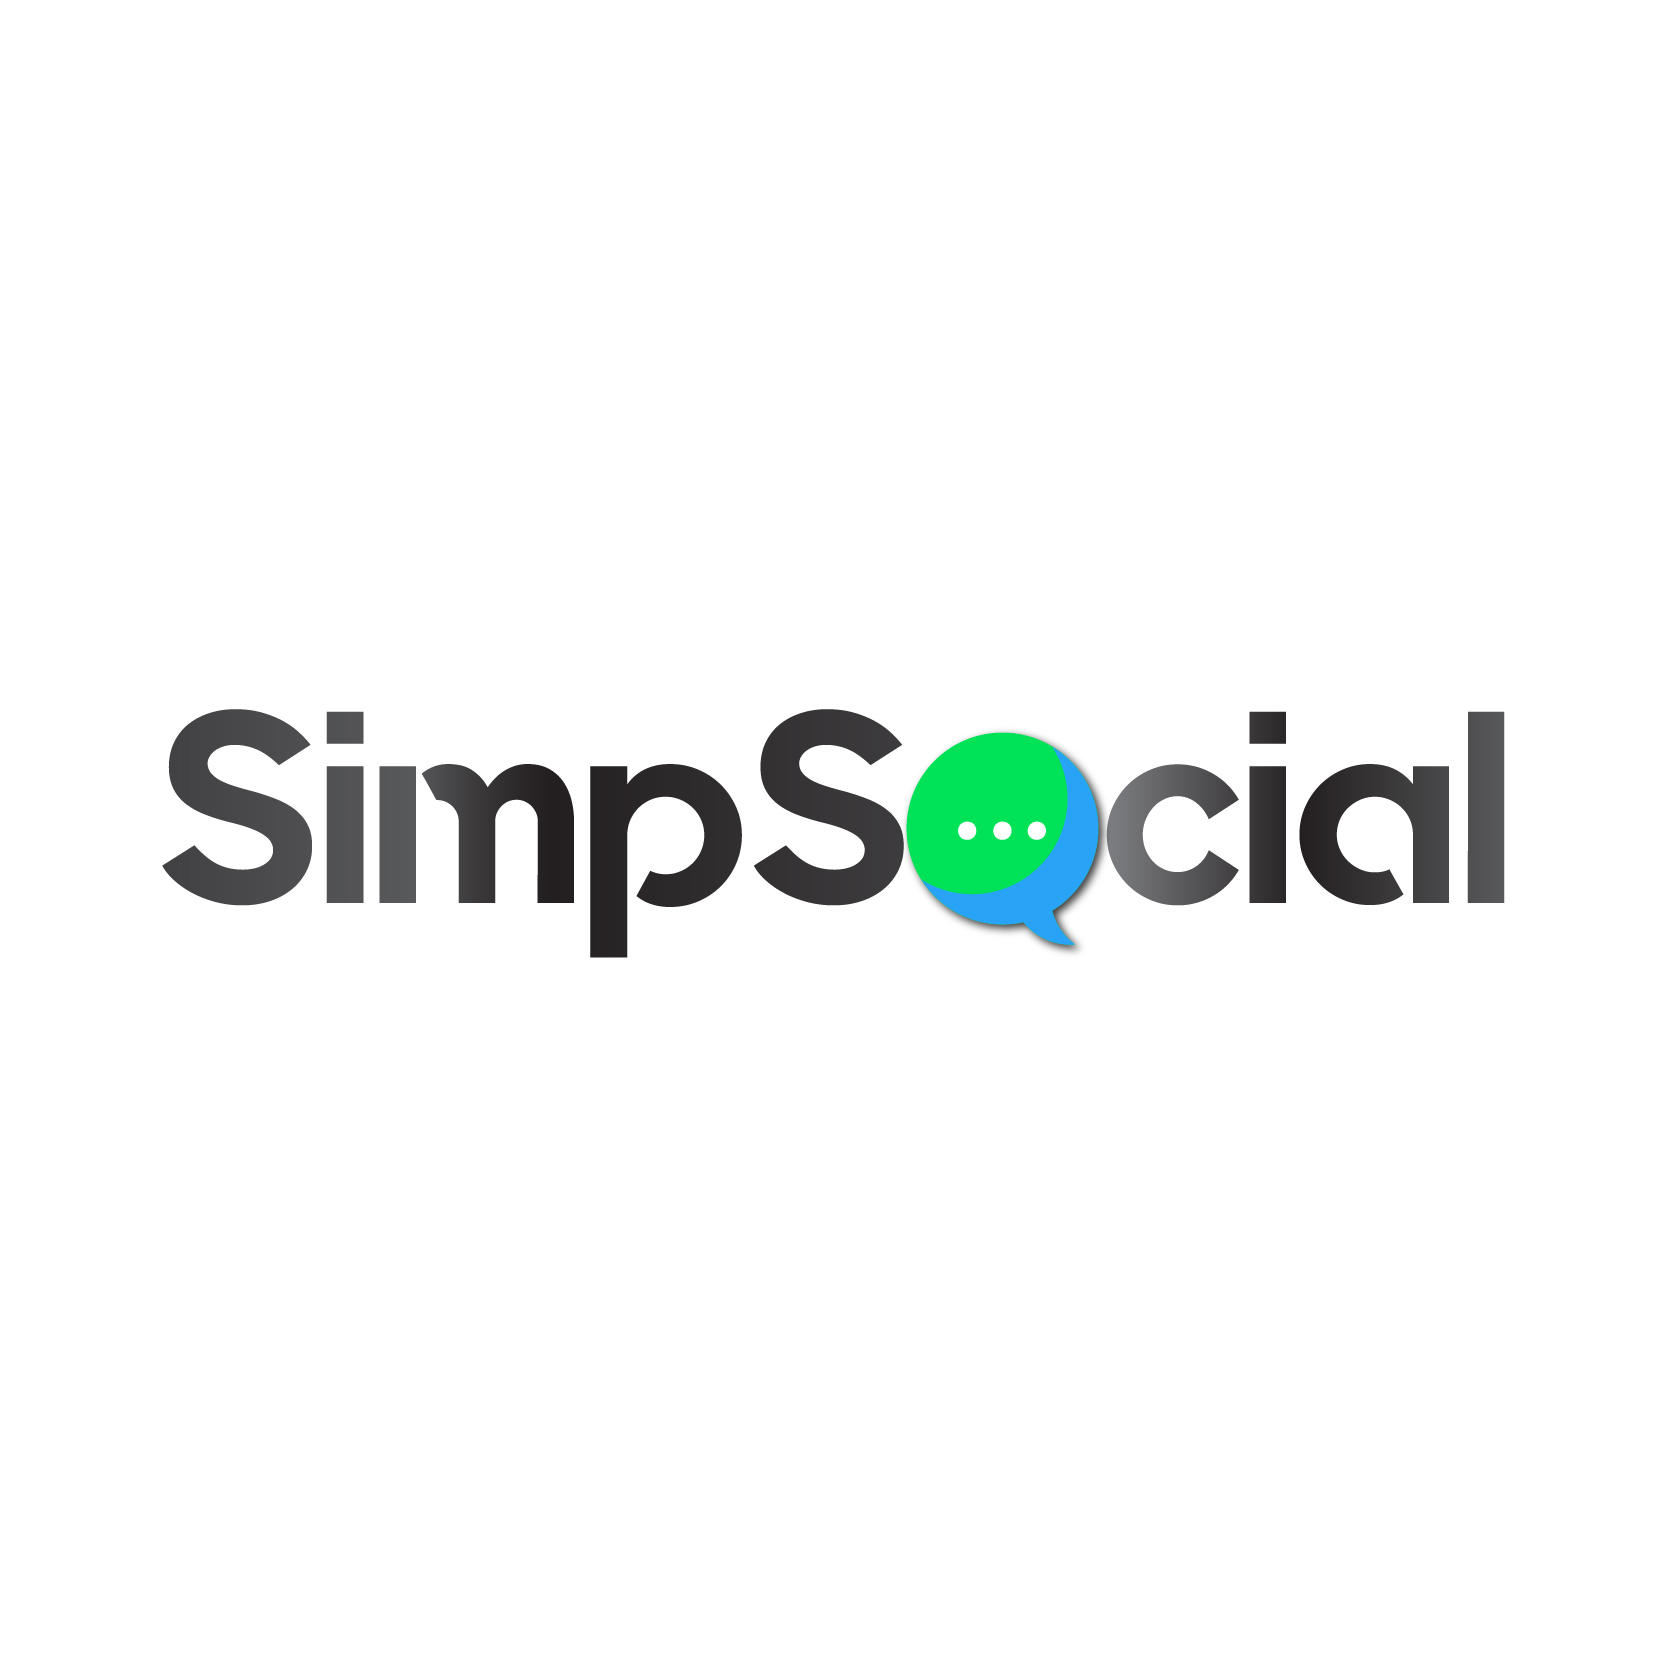 SimpSocial LLC